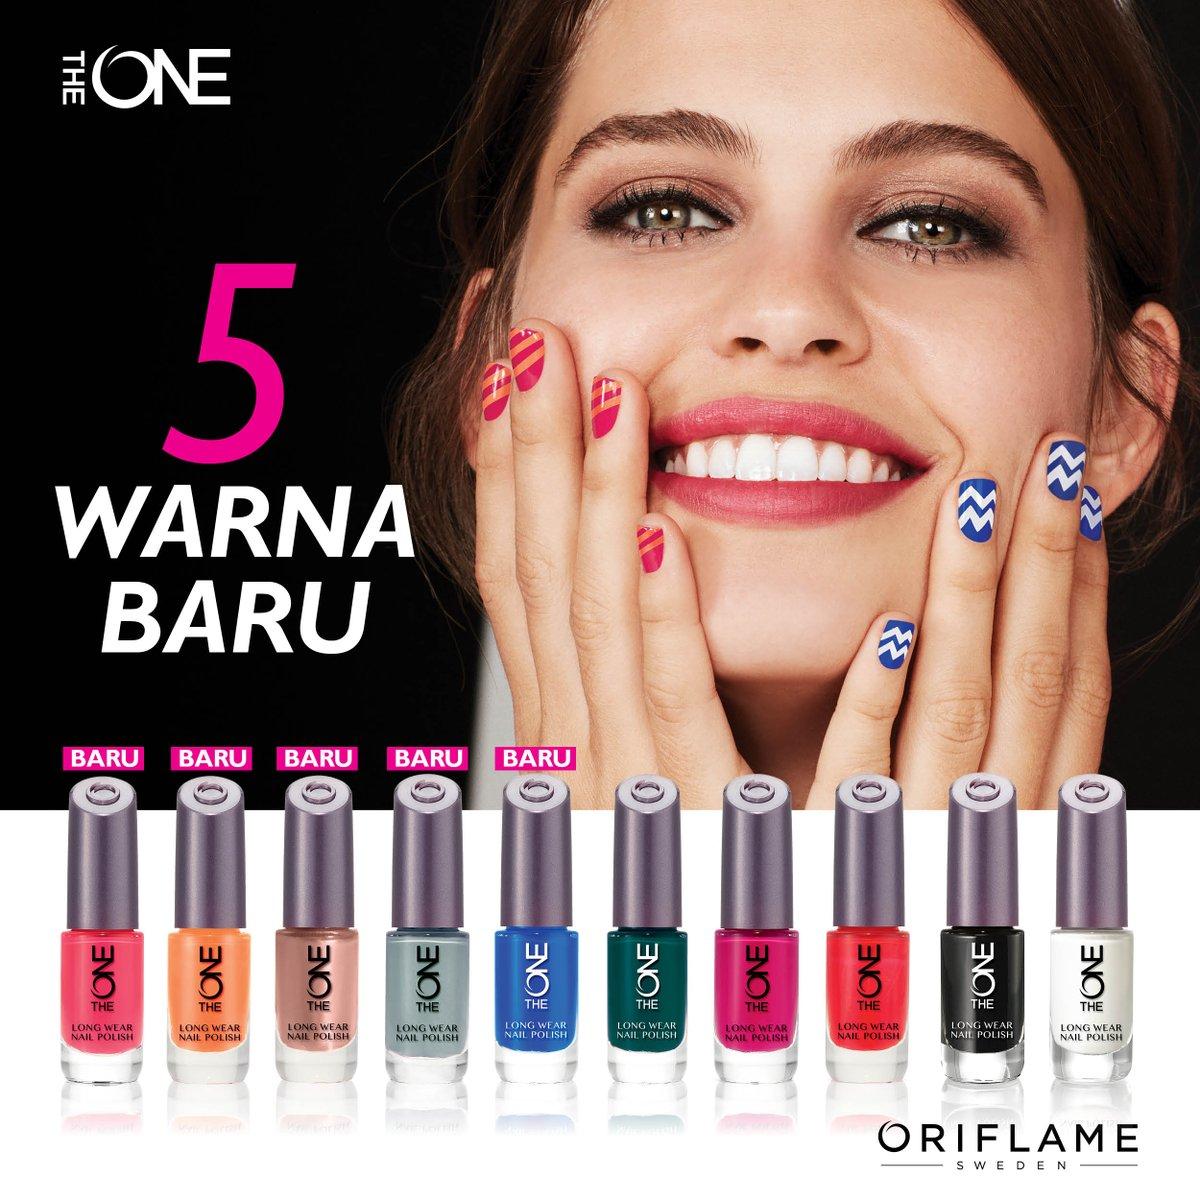 Oriflame Indonesia على تويتر Sudah Punya 5 Warna Baru Dari The One Long Wear Nail Polish Yang Ceria Ini Kalau Belum Yuk Lengkapi Koleksi Kutek Anda Sekarang Dengan Penawaran Harga Spesial Hanya